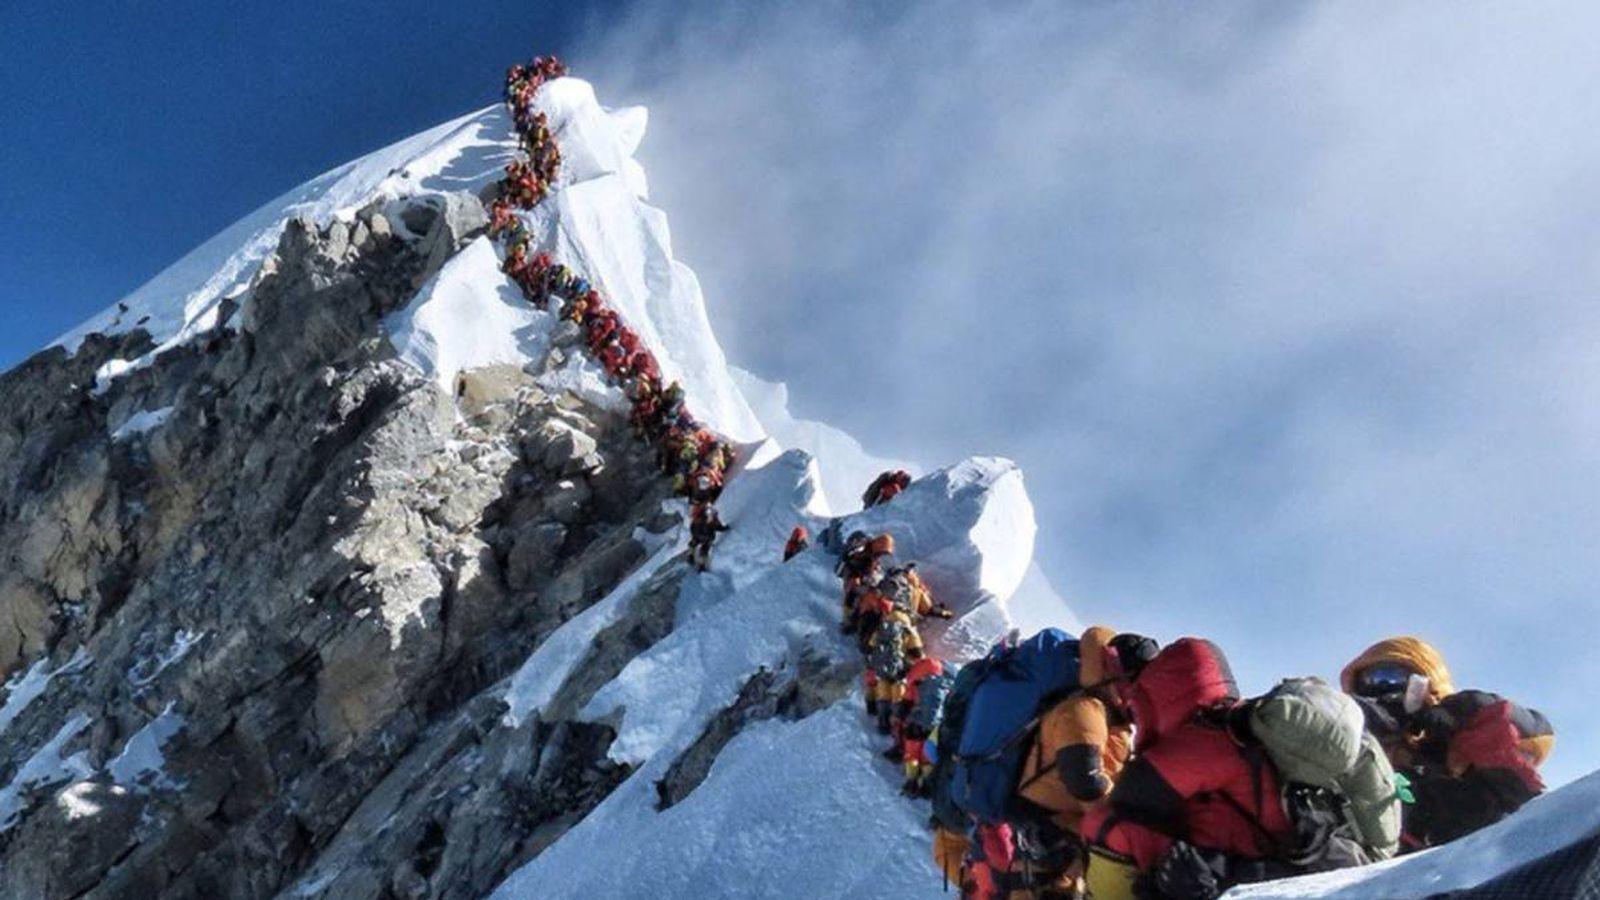 Foto: Colas para subir a la cima del Everest. (Nirmal Purja)